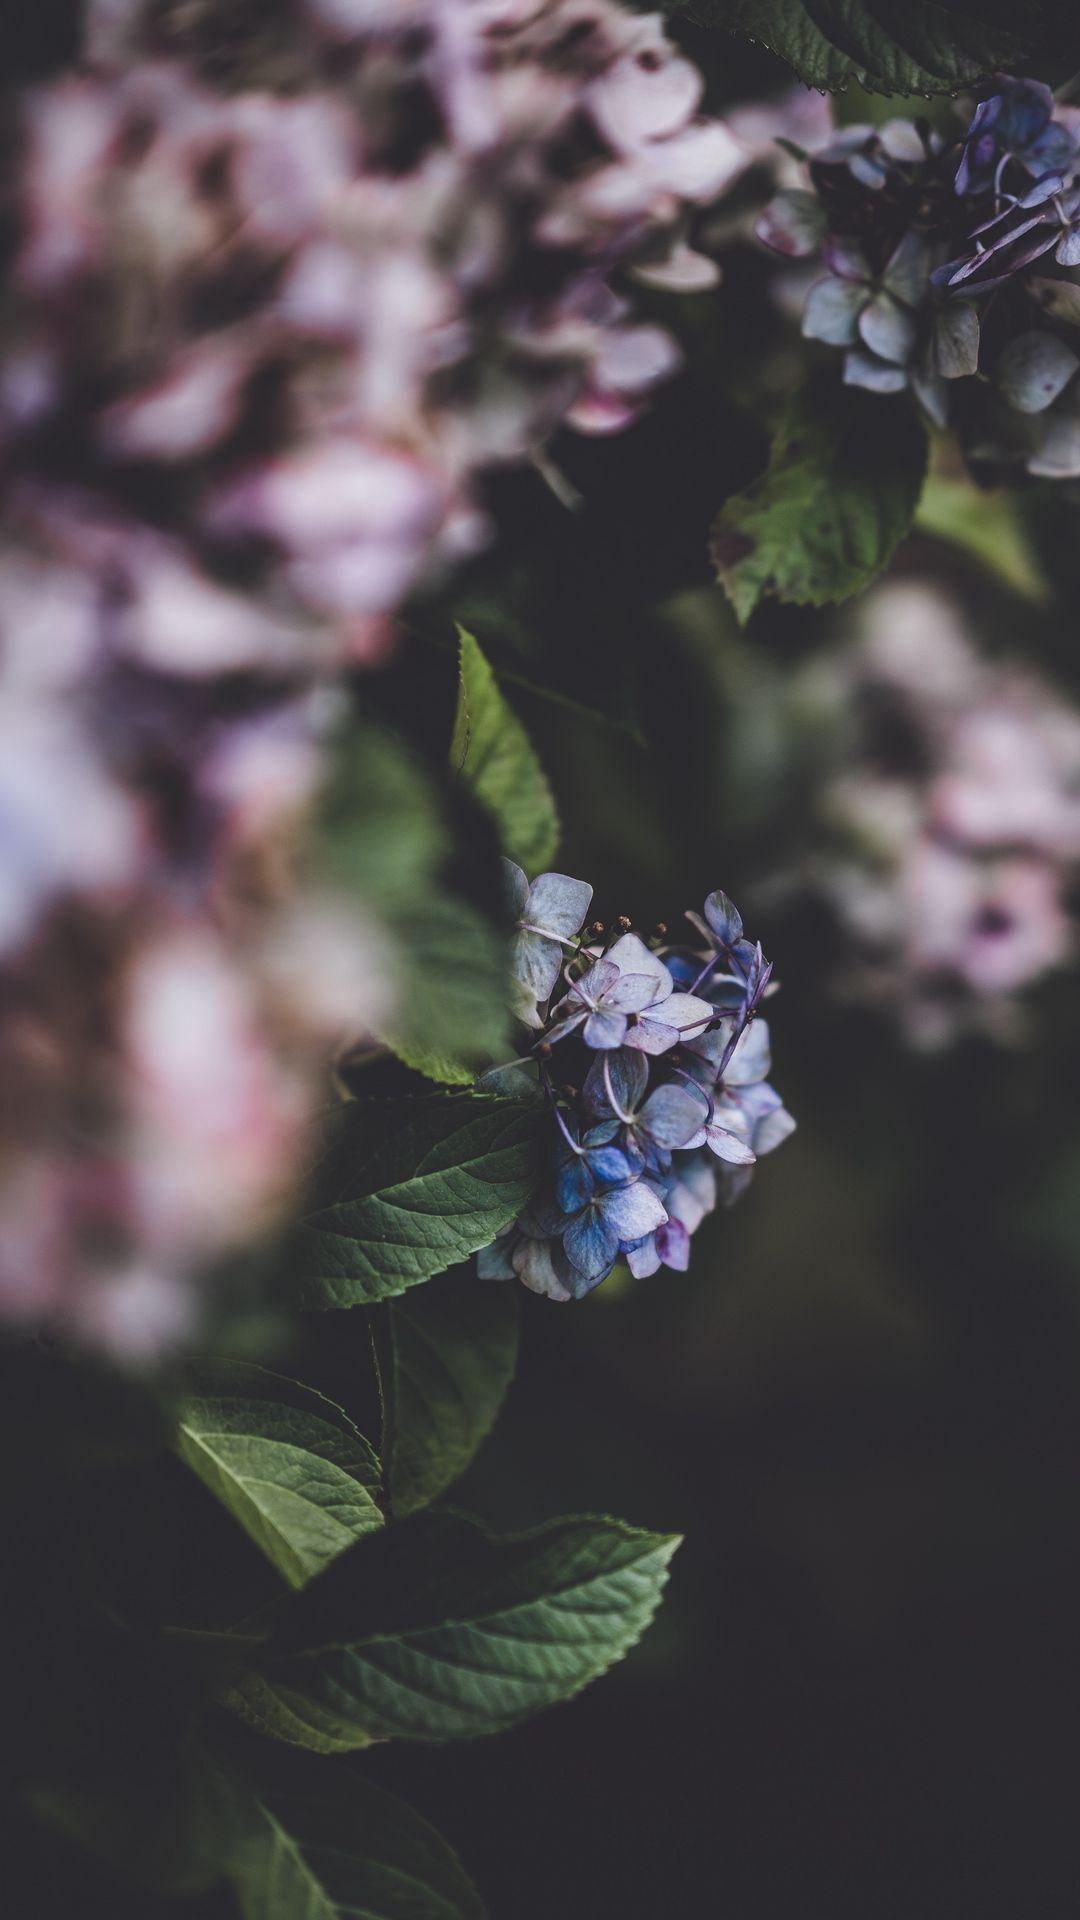 Hydrangea Blurred Fln